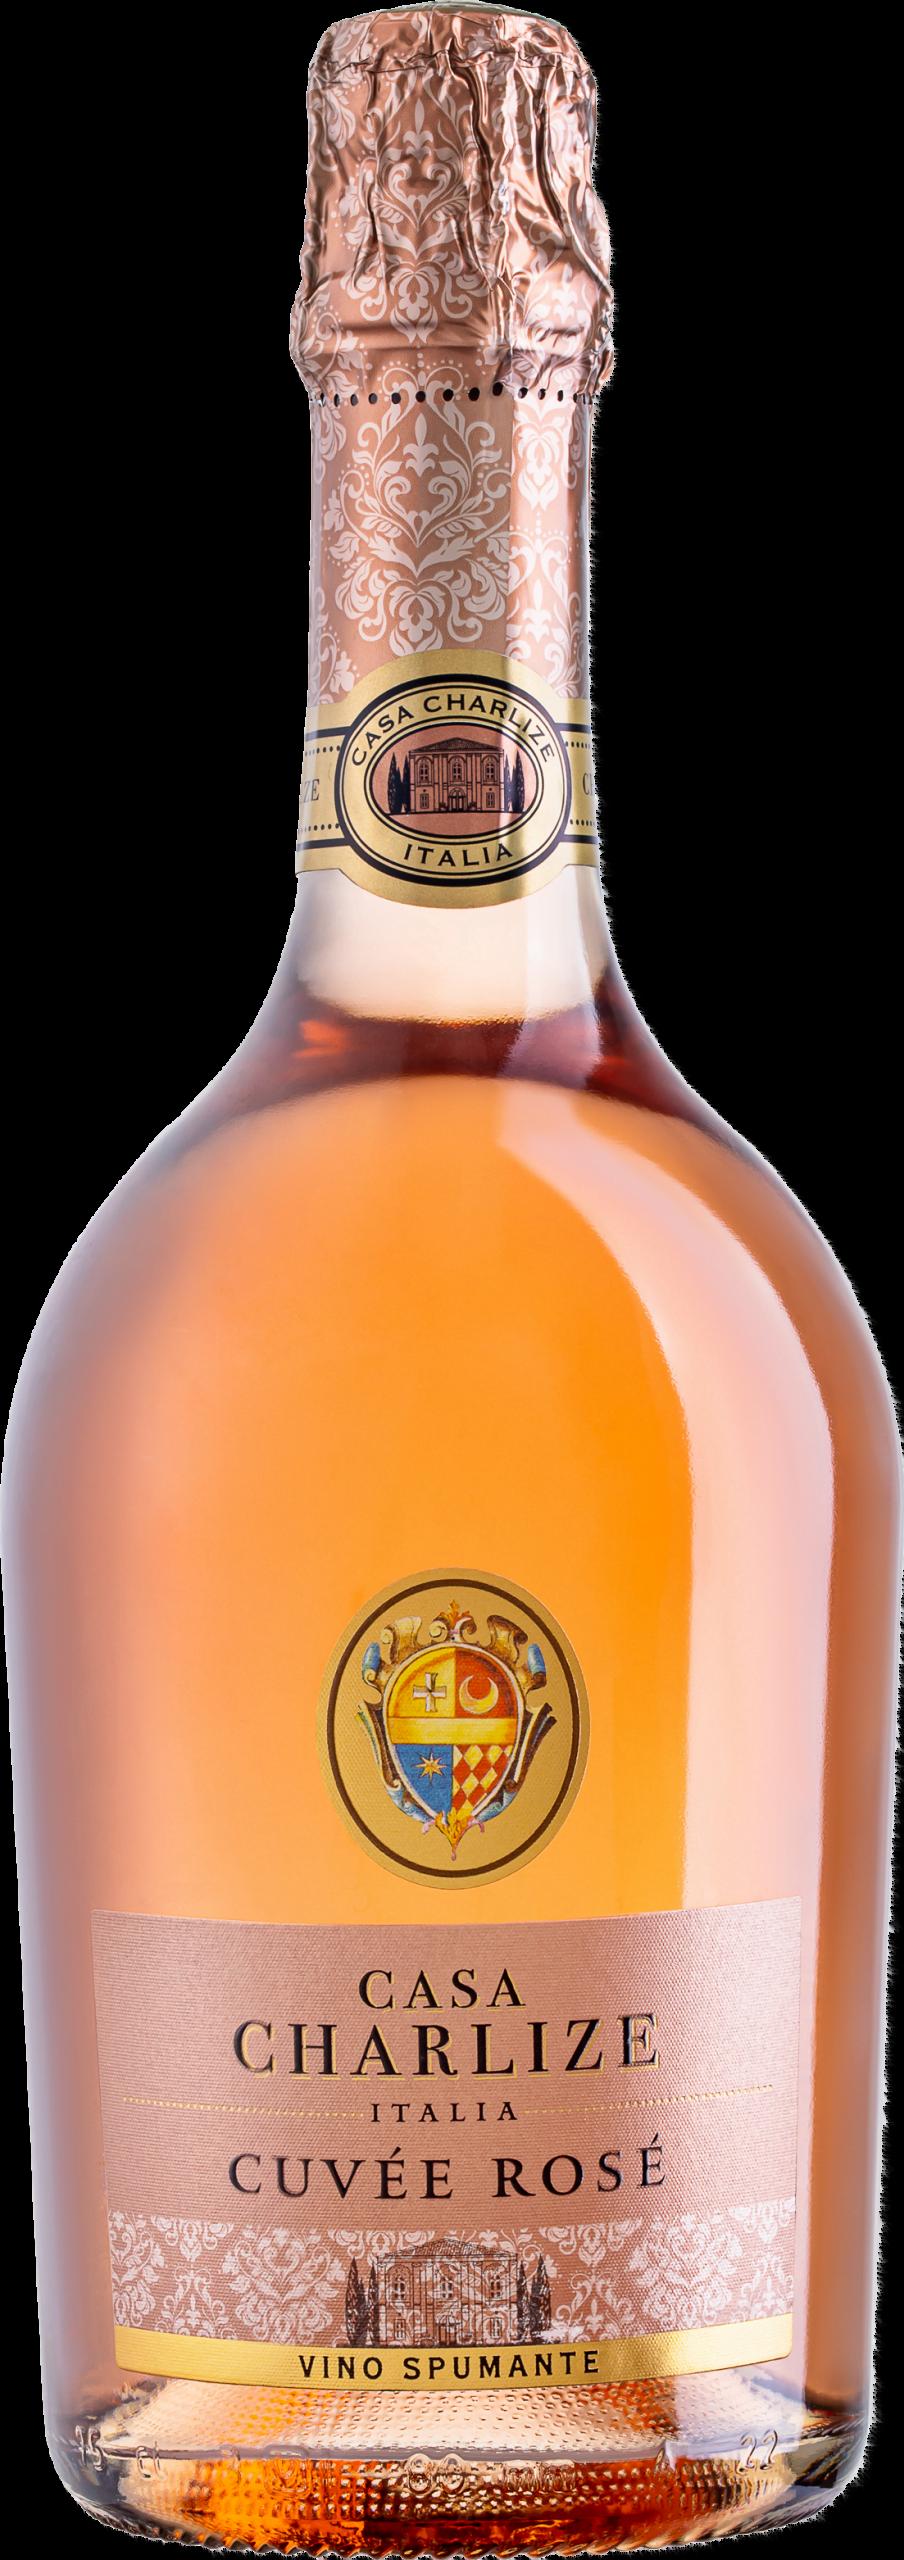 Casa Charlize Cuvée Rosé Spumante